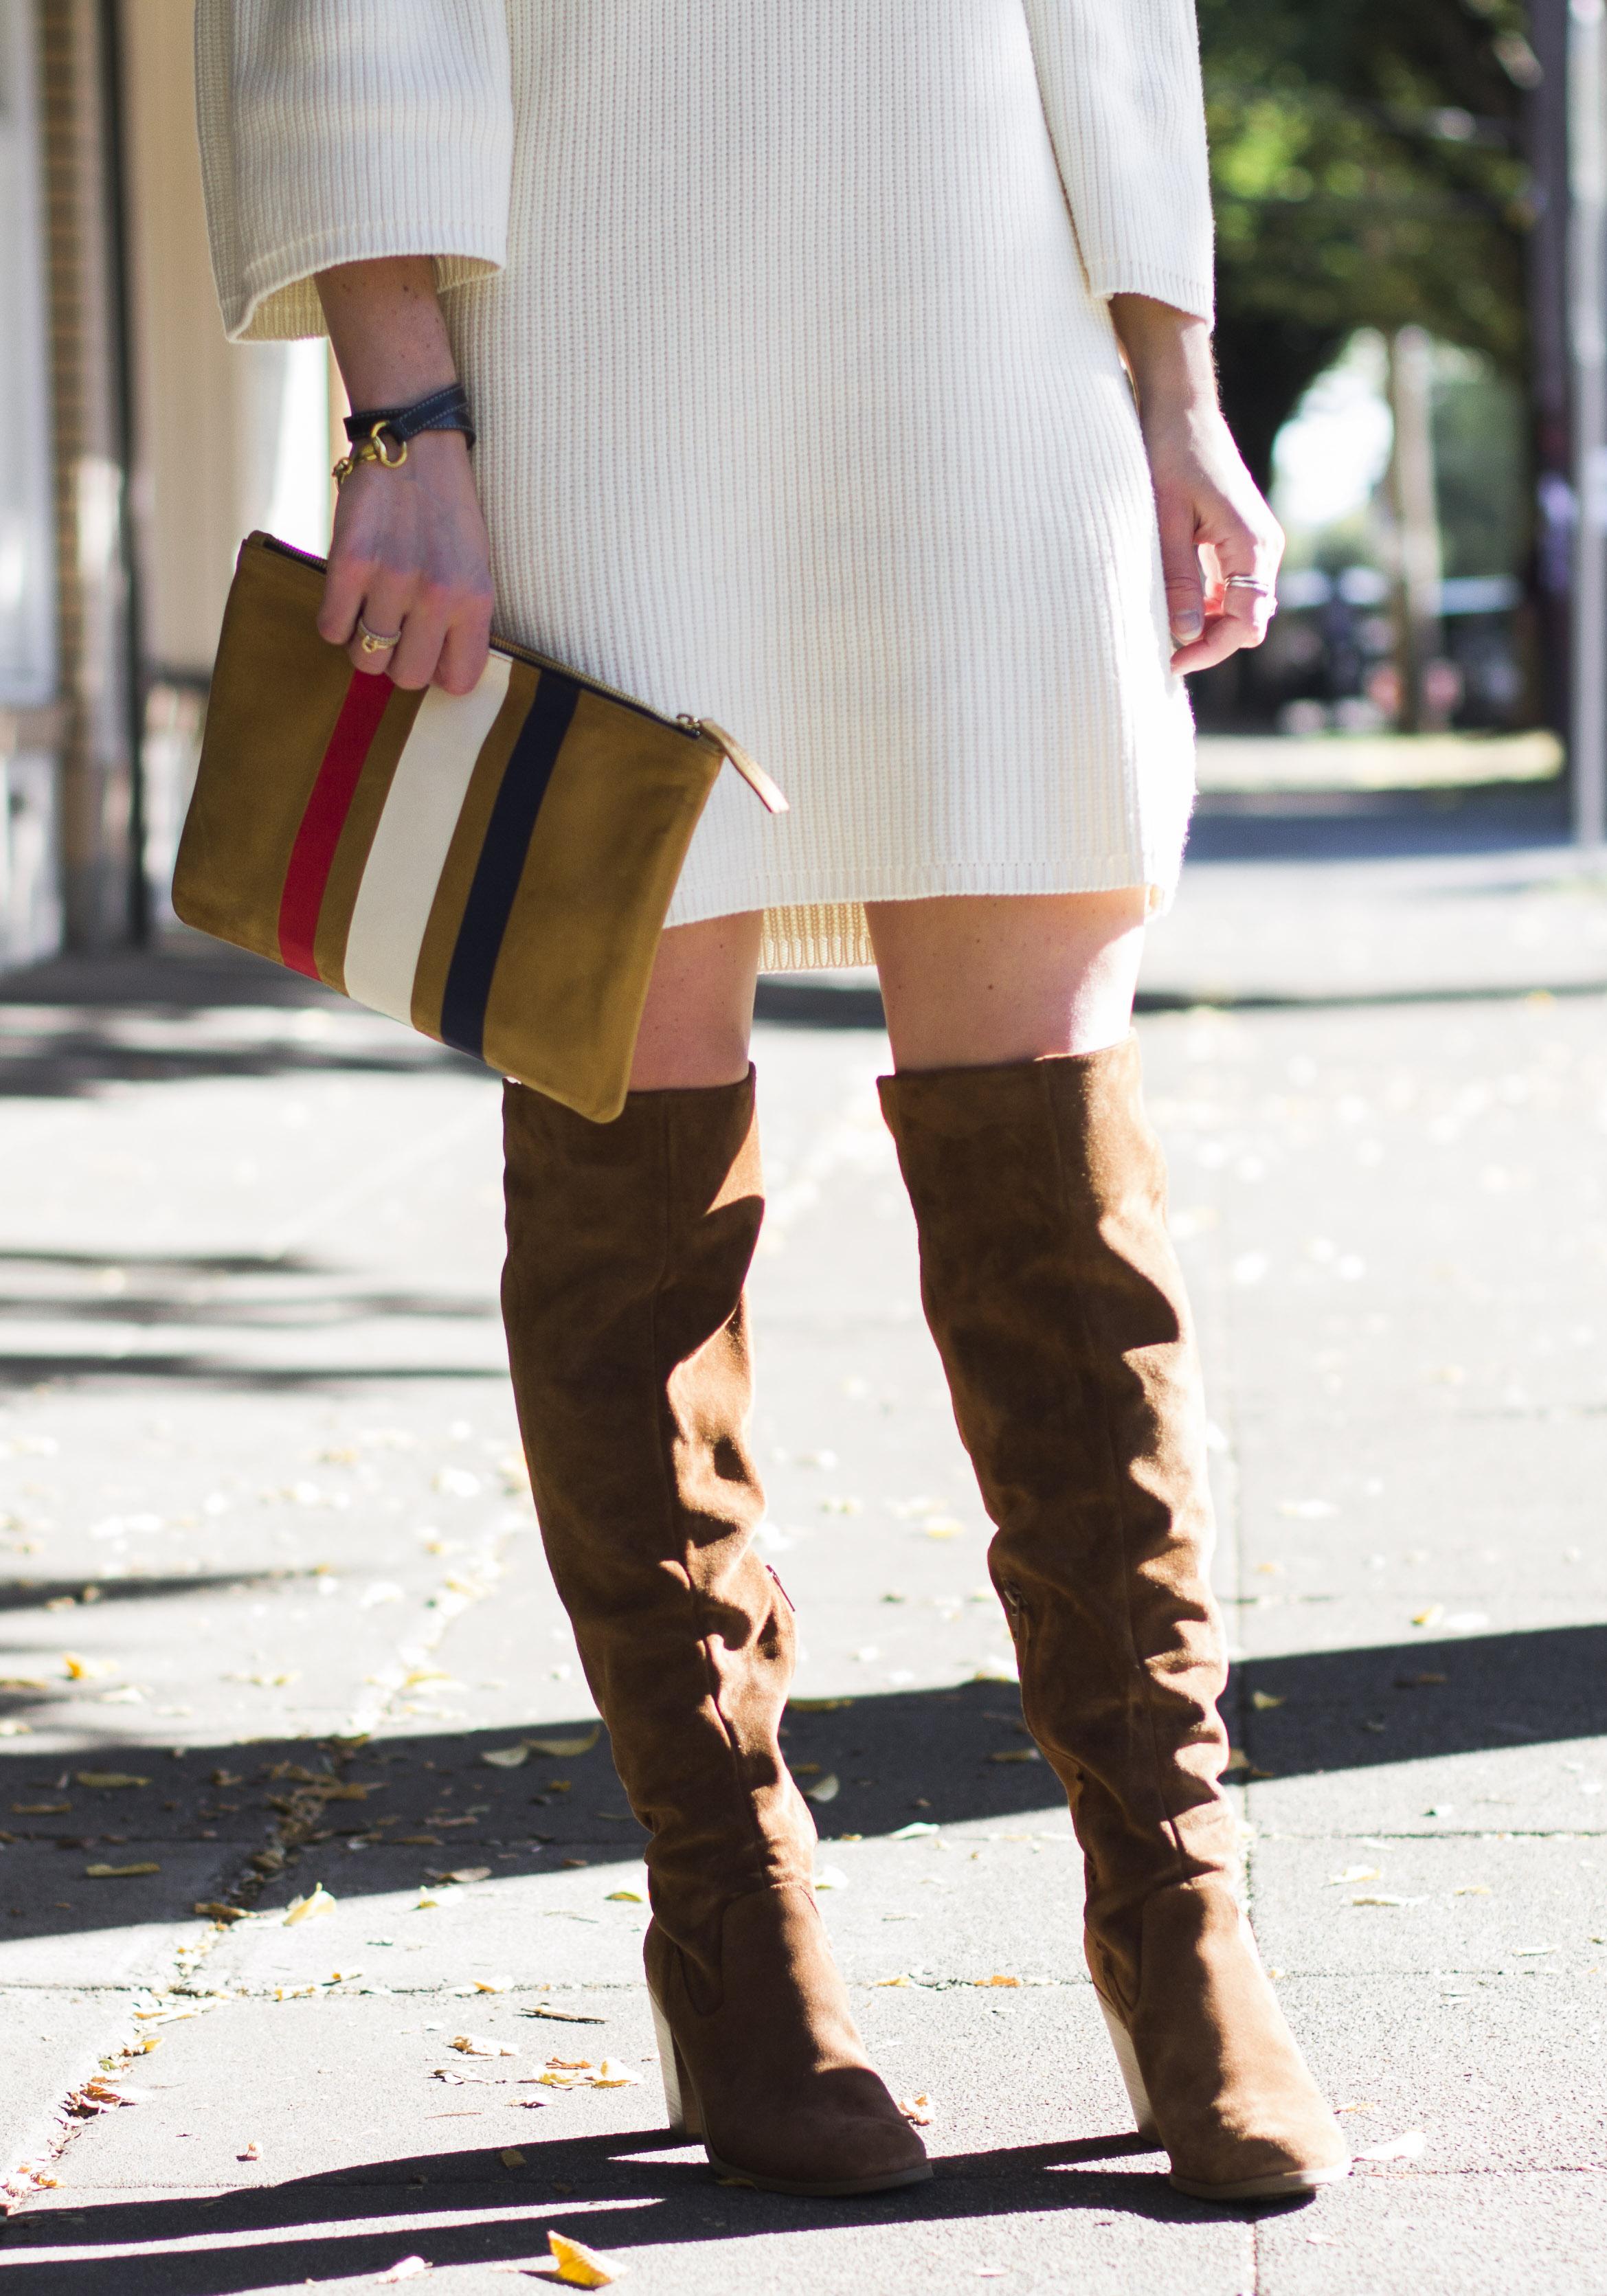 Cute Fall Outfits, Minkpink Shameless Sweater Dress with Steve Madden Eternul Over The Knee Boots, Clare V. Stripe Clutch, Karen Walker Cat Eye Sunglasses, Sweater dress with OTK boots.